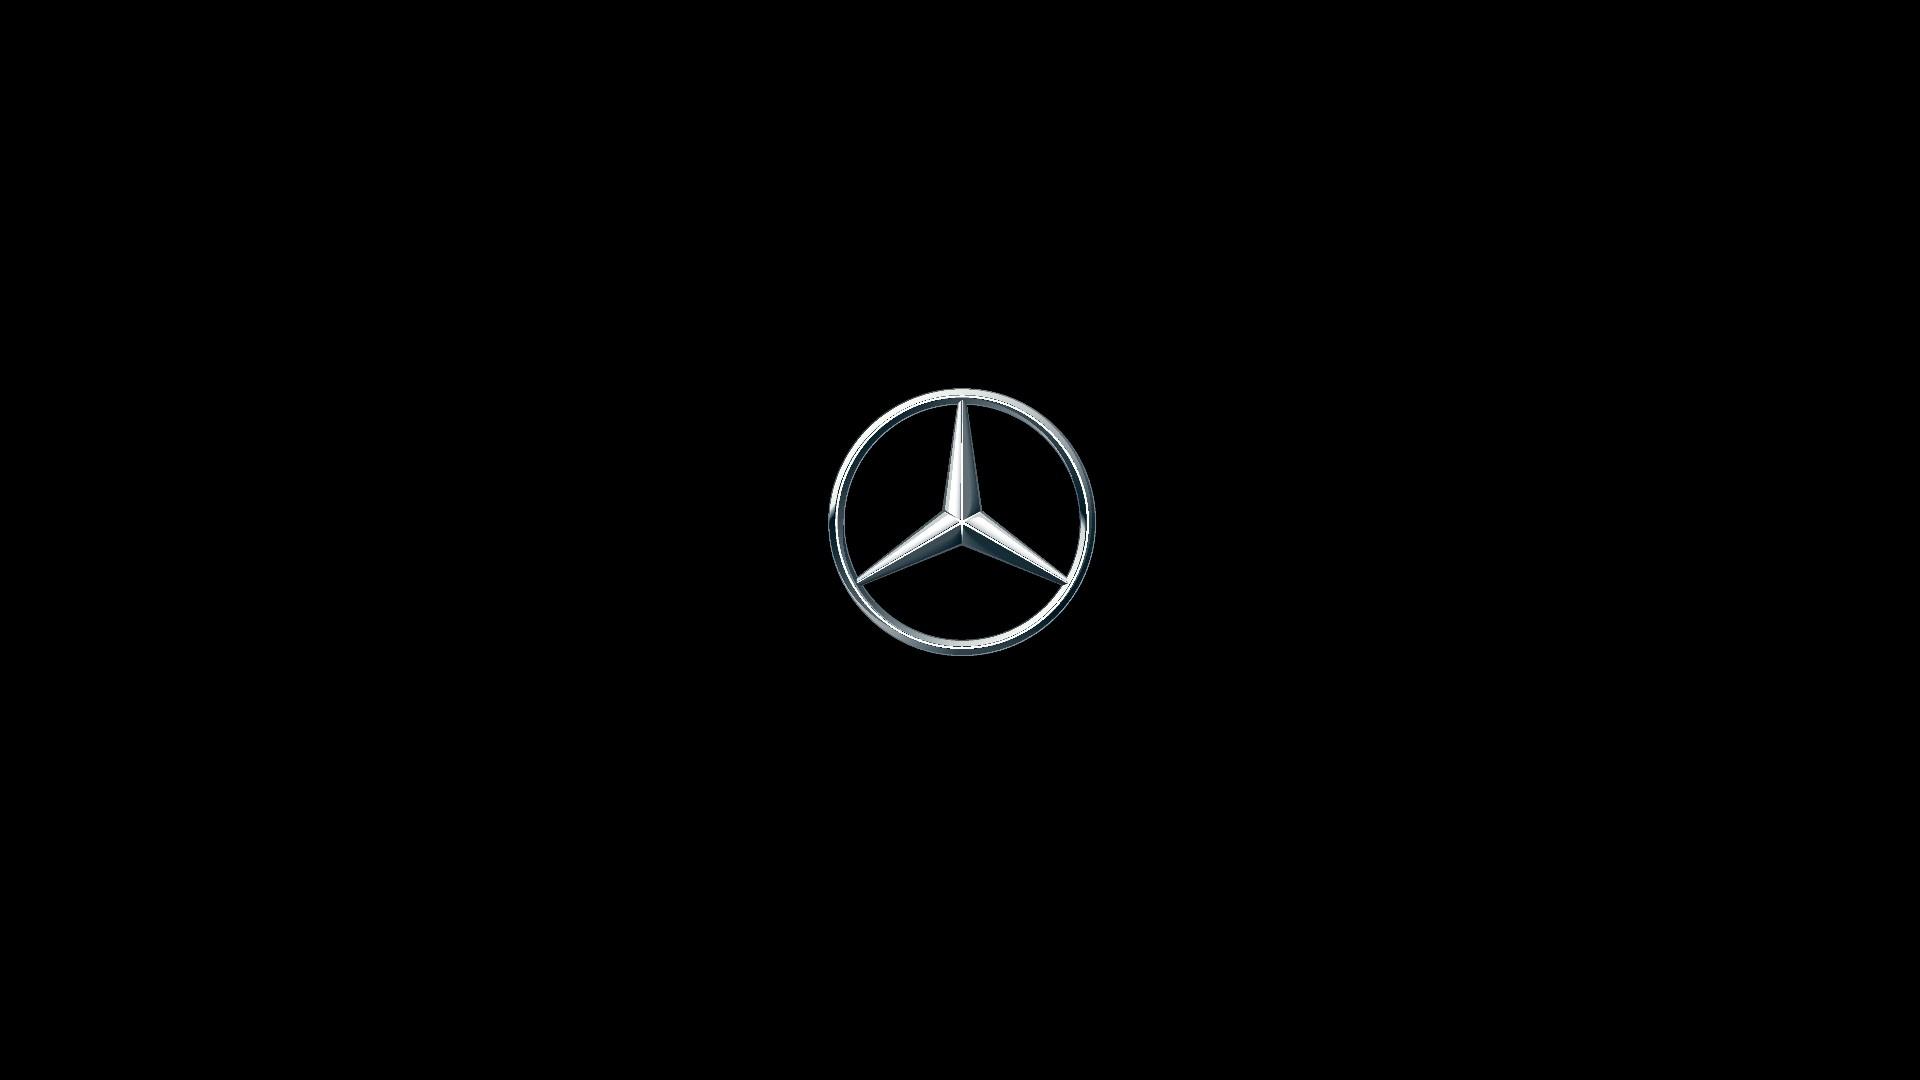 500 Wallpaper Black Logo Hd HD Paling Keren